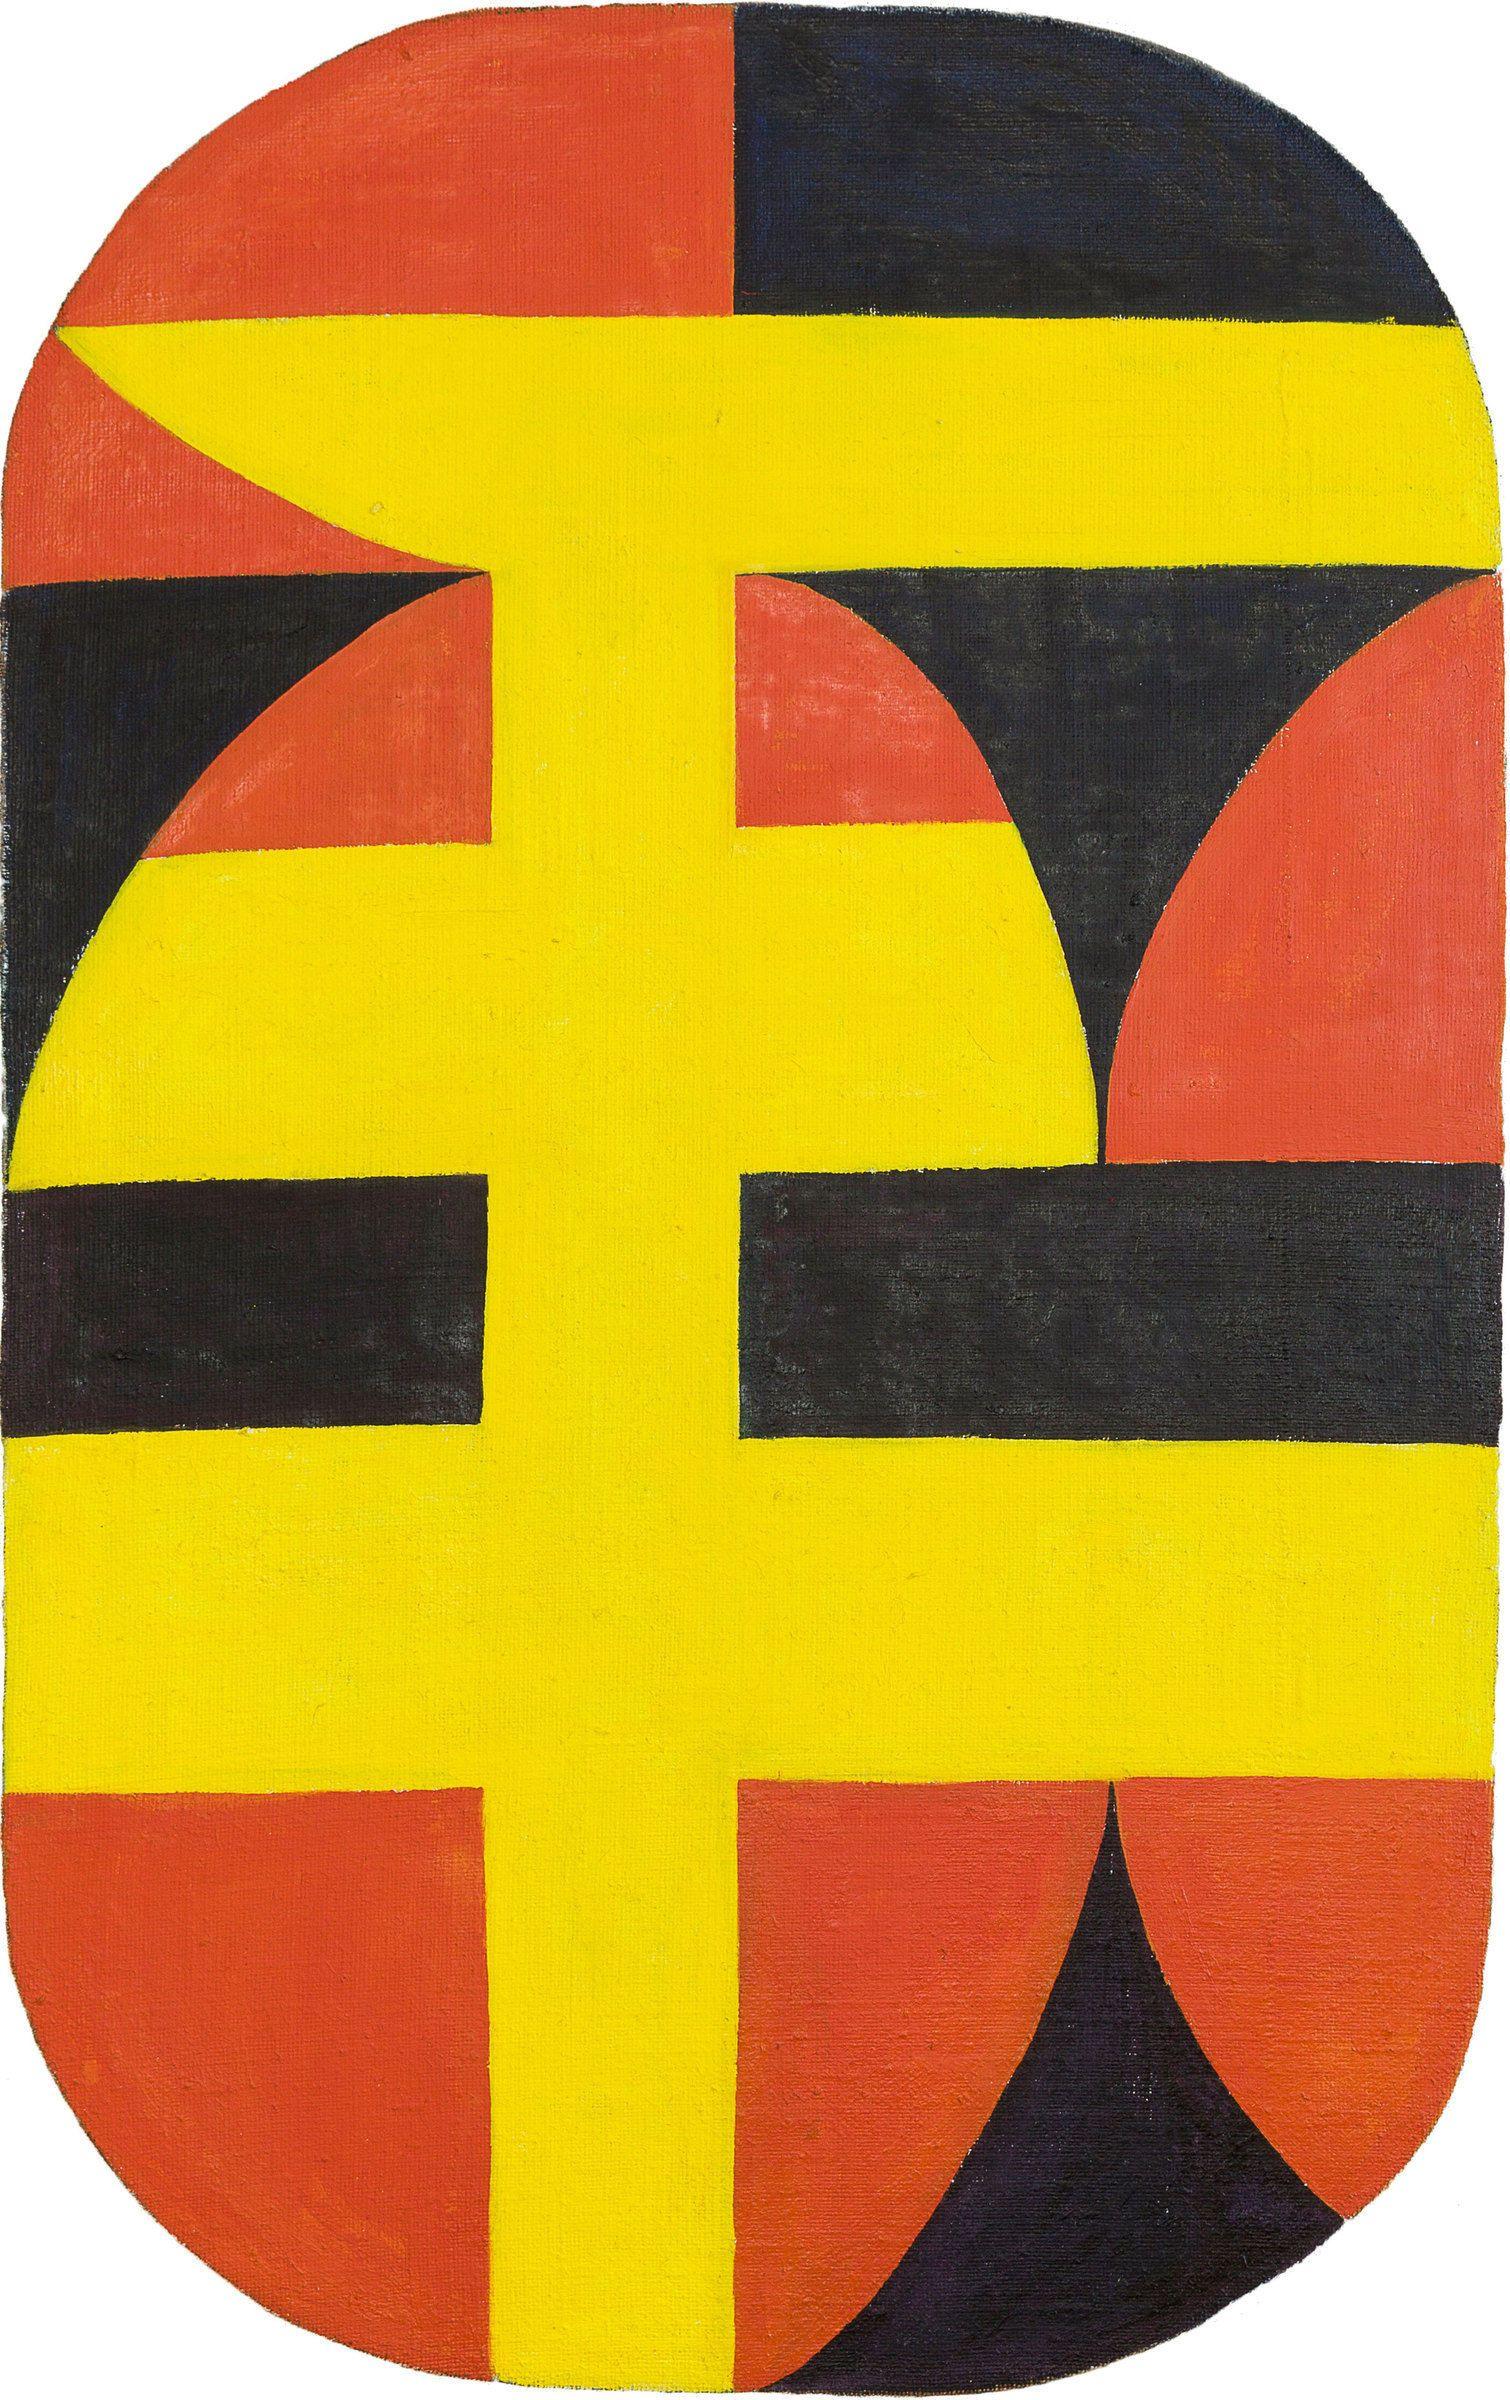 Carmen herrera lines of sight whitney museum of